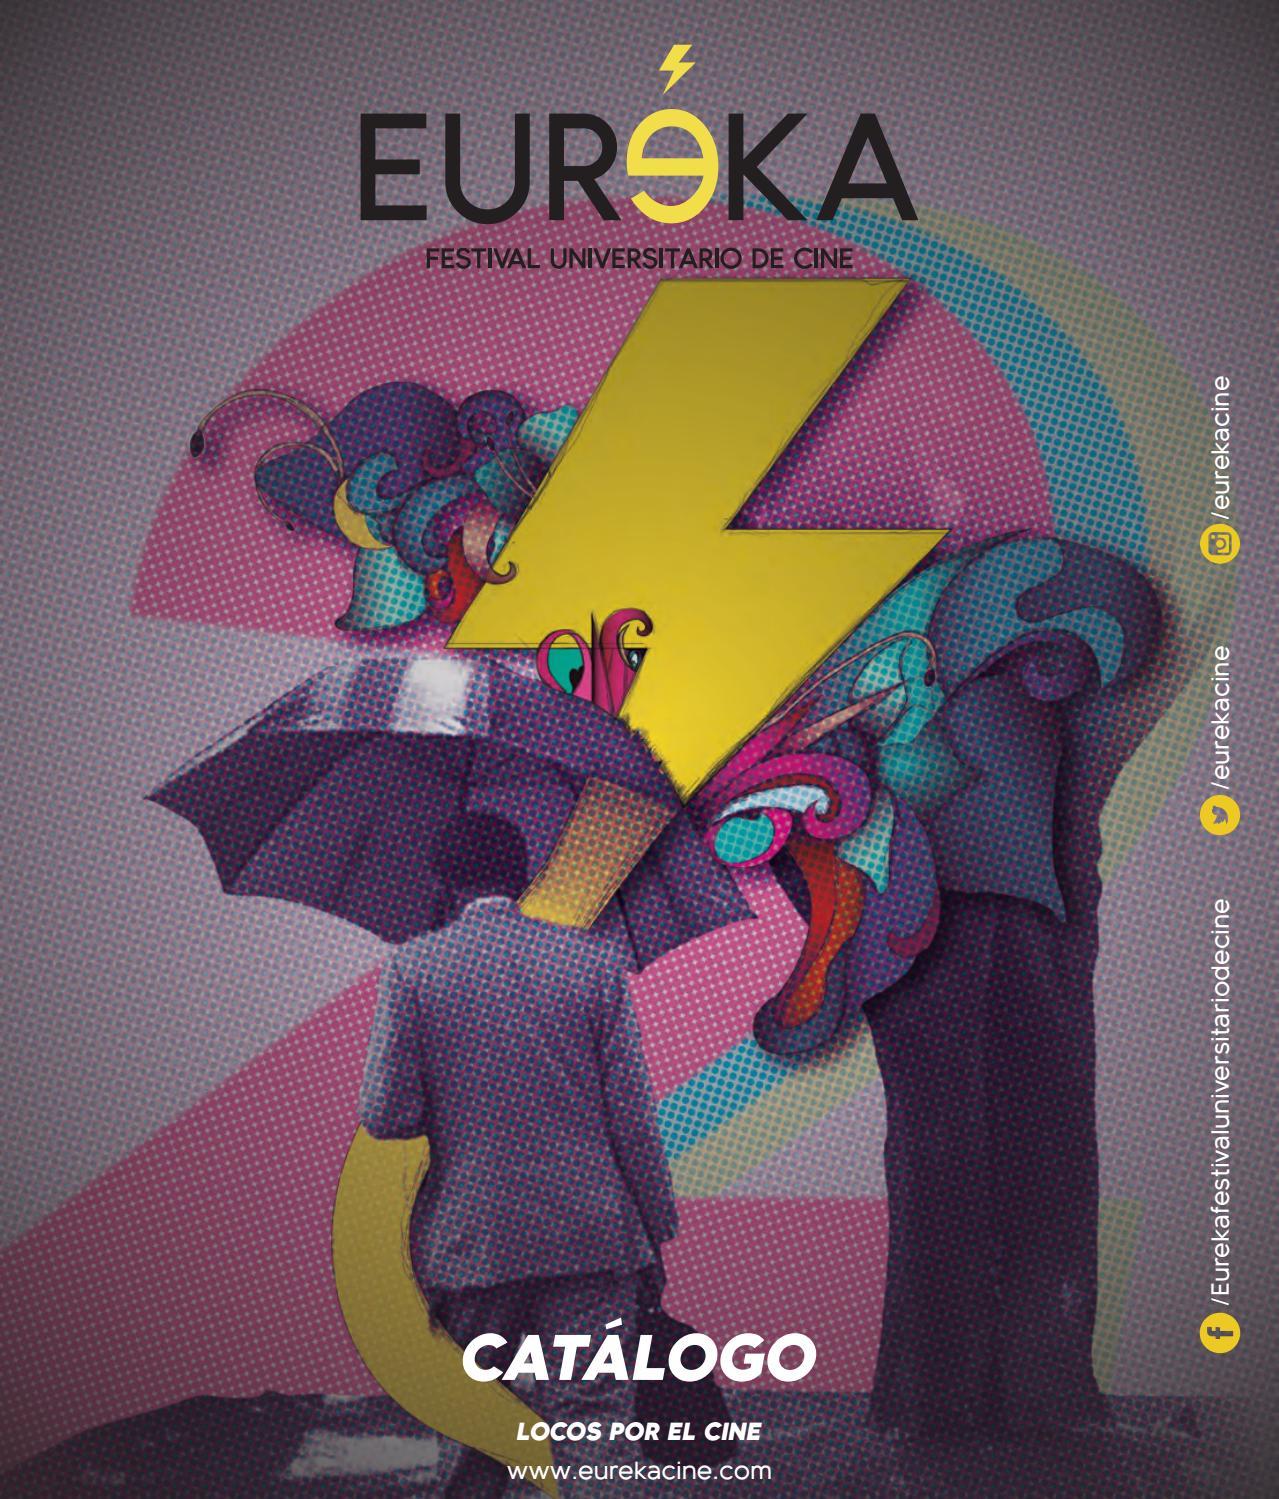 487287a88 Catalogo Oficial - EUREKA 2017 by EUREKA Festival - issuu